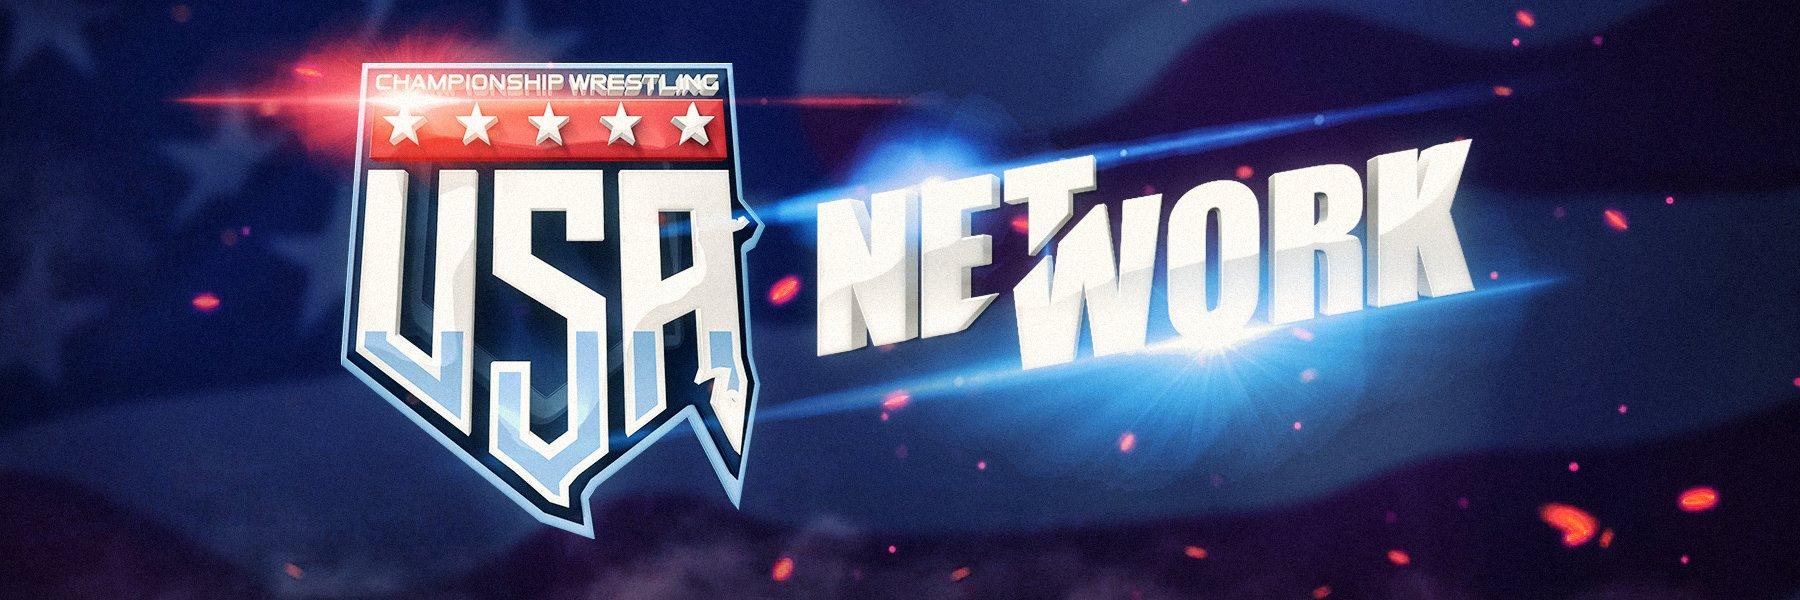 USA Championship Wrestling